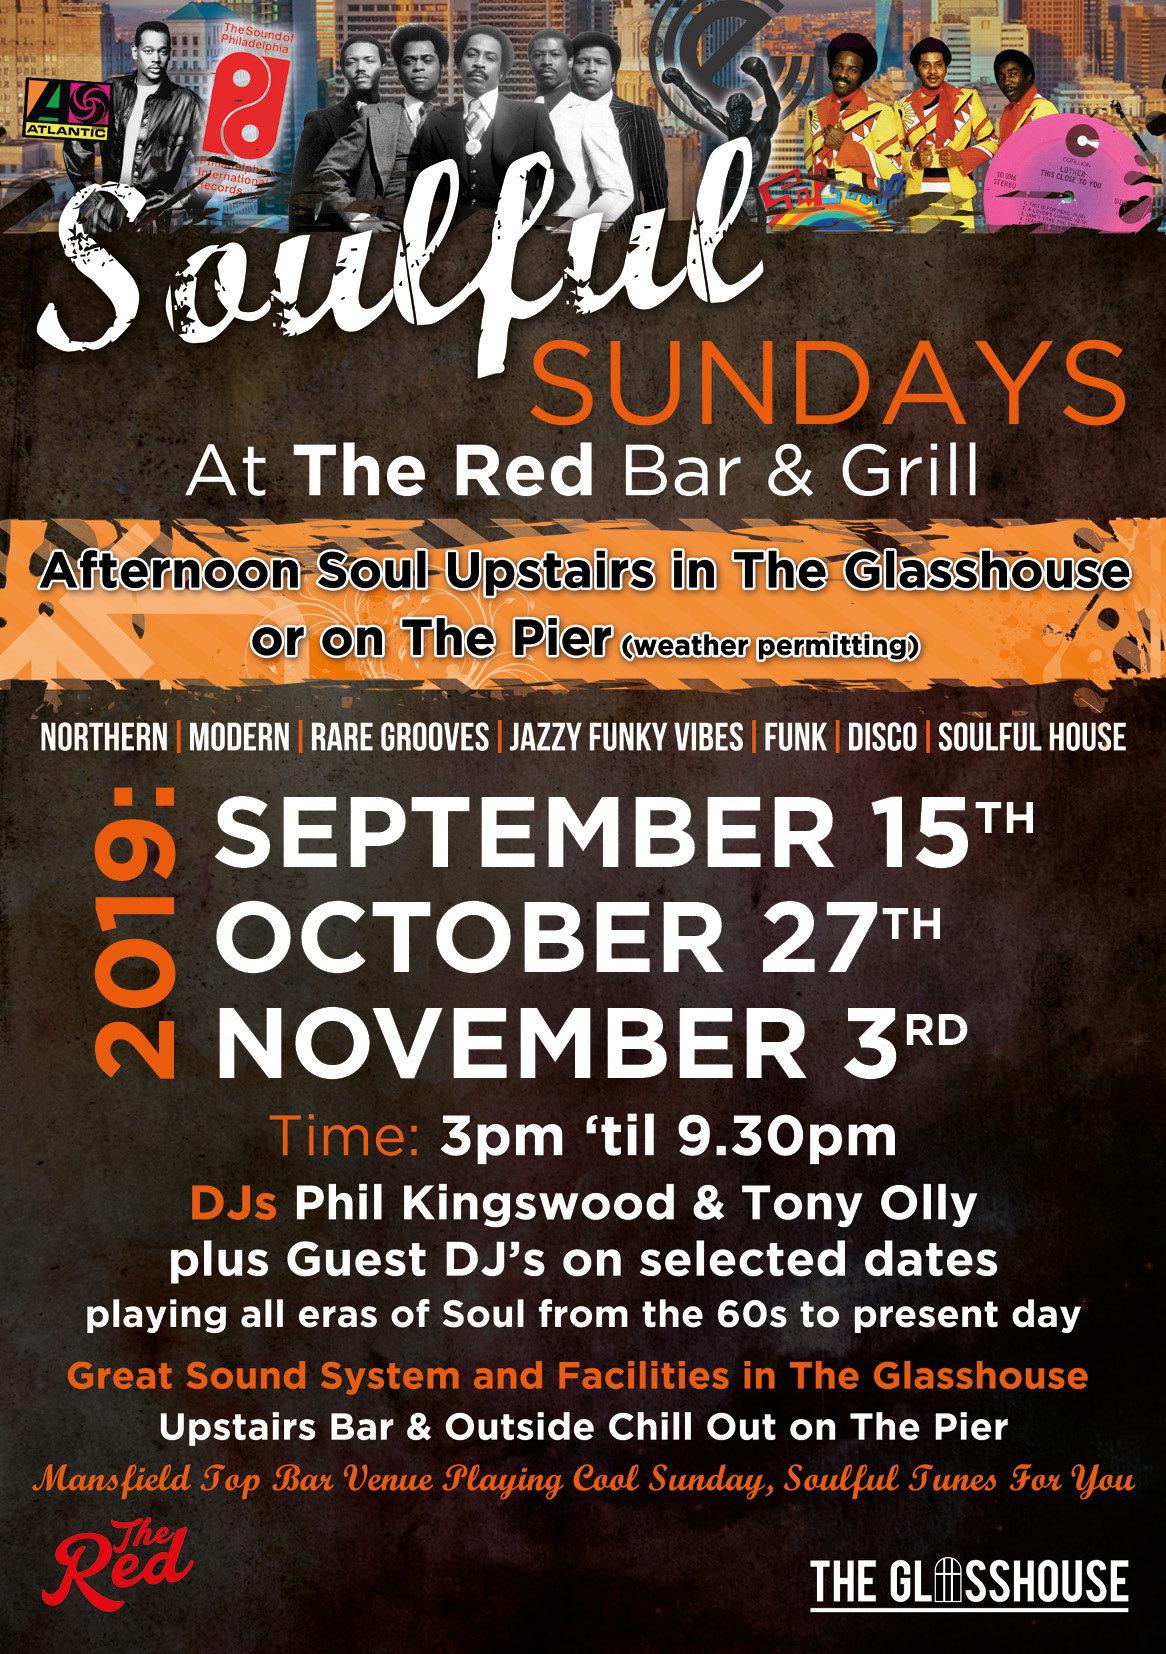 Red Bar Soulful Sundays flyer